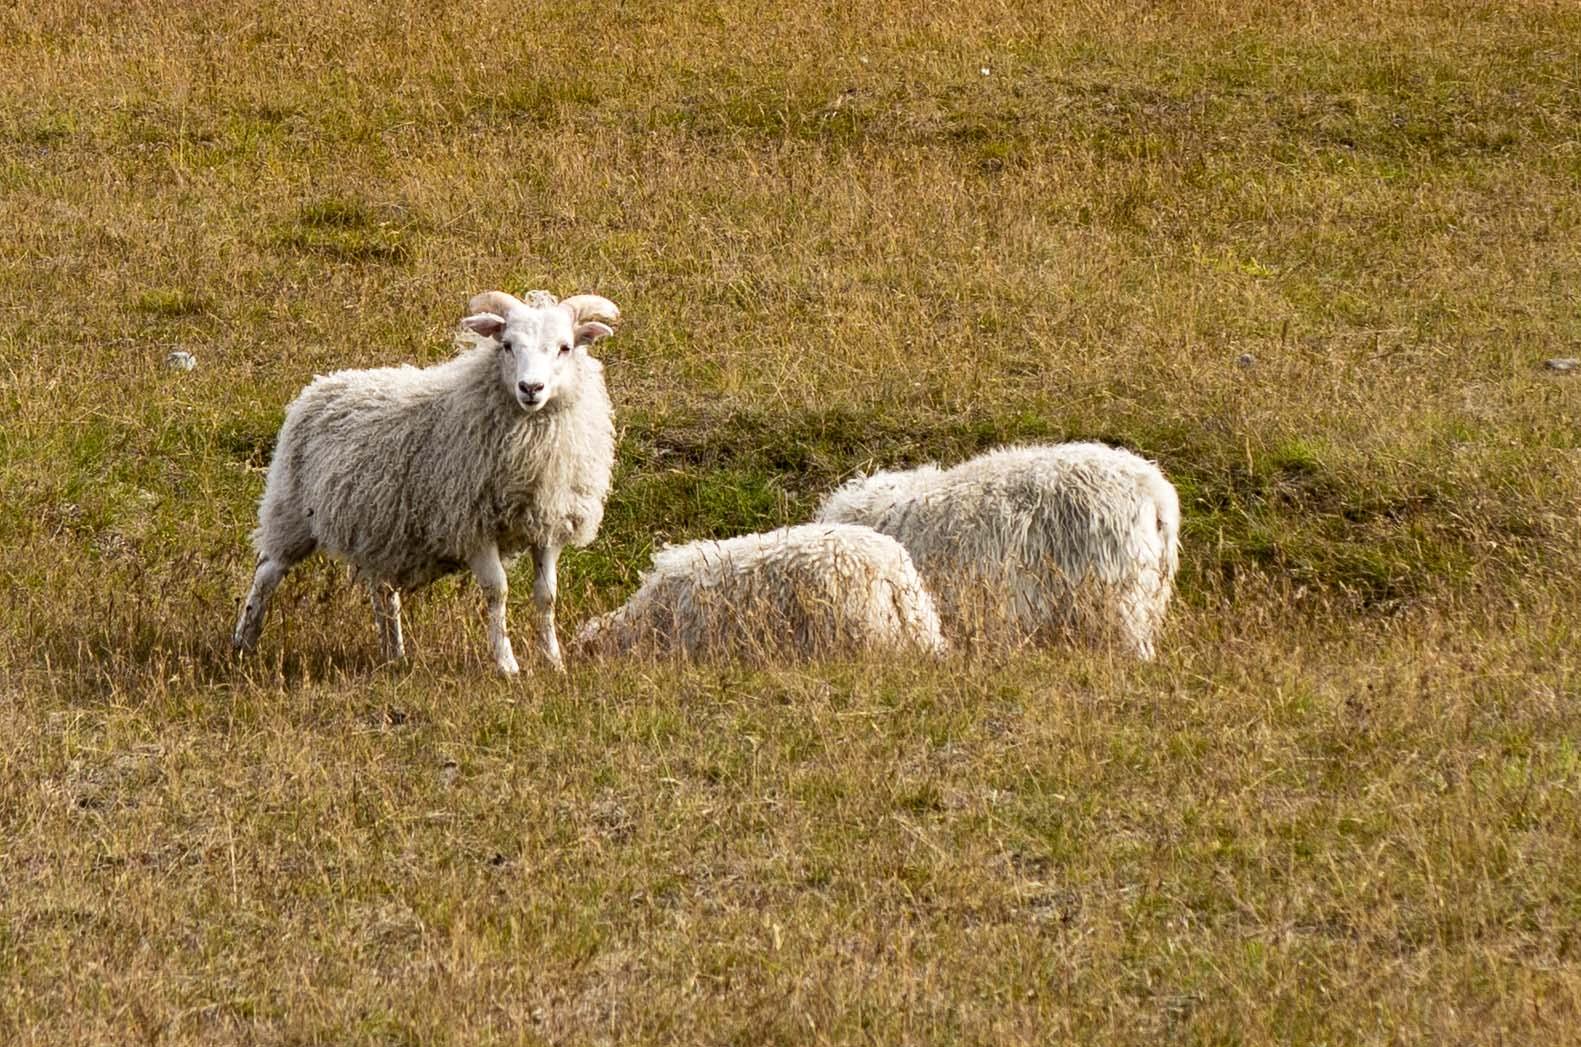 Sheep copy